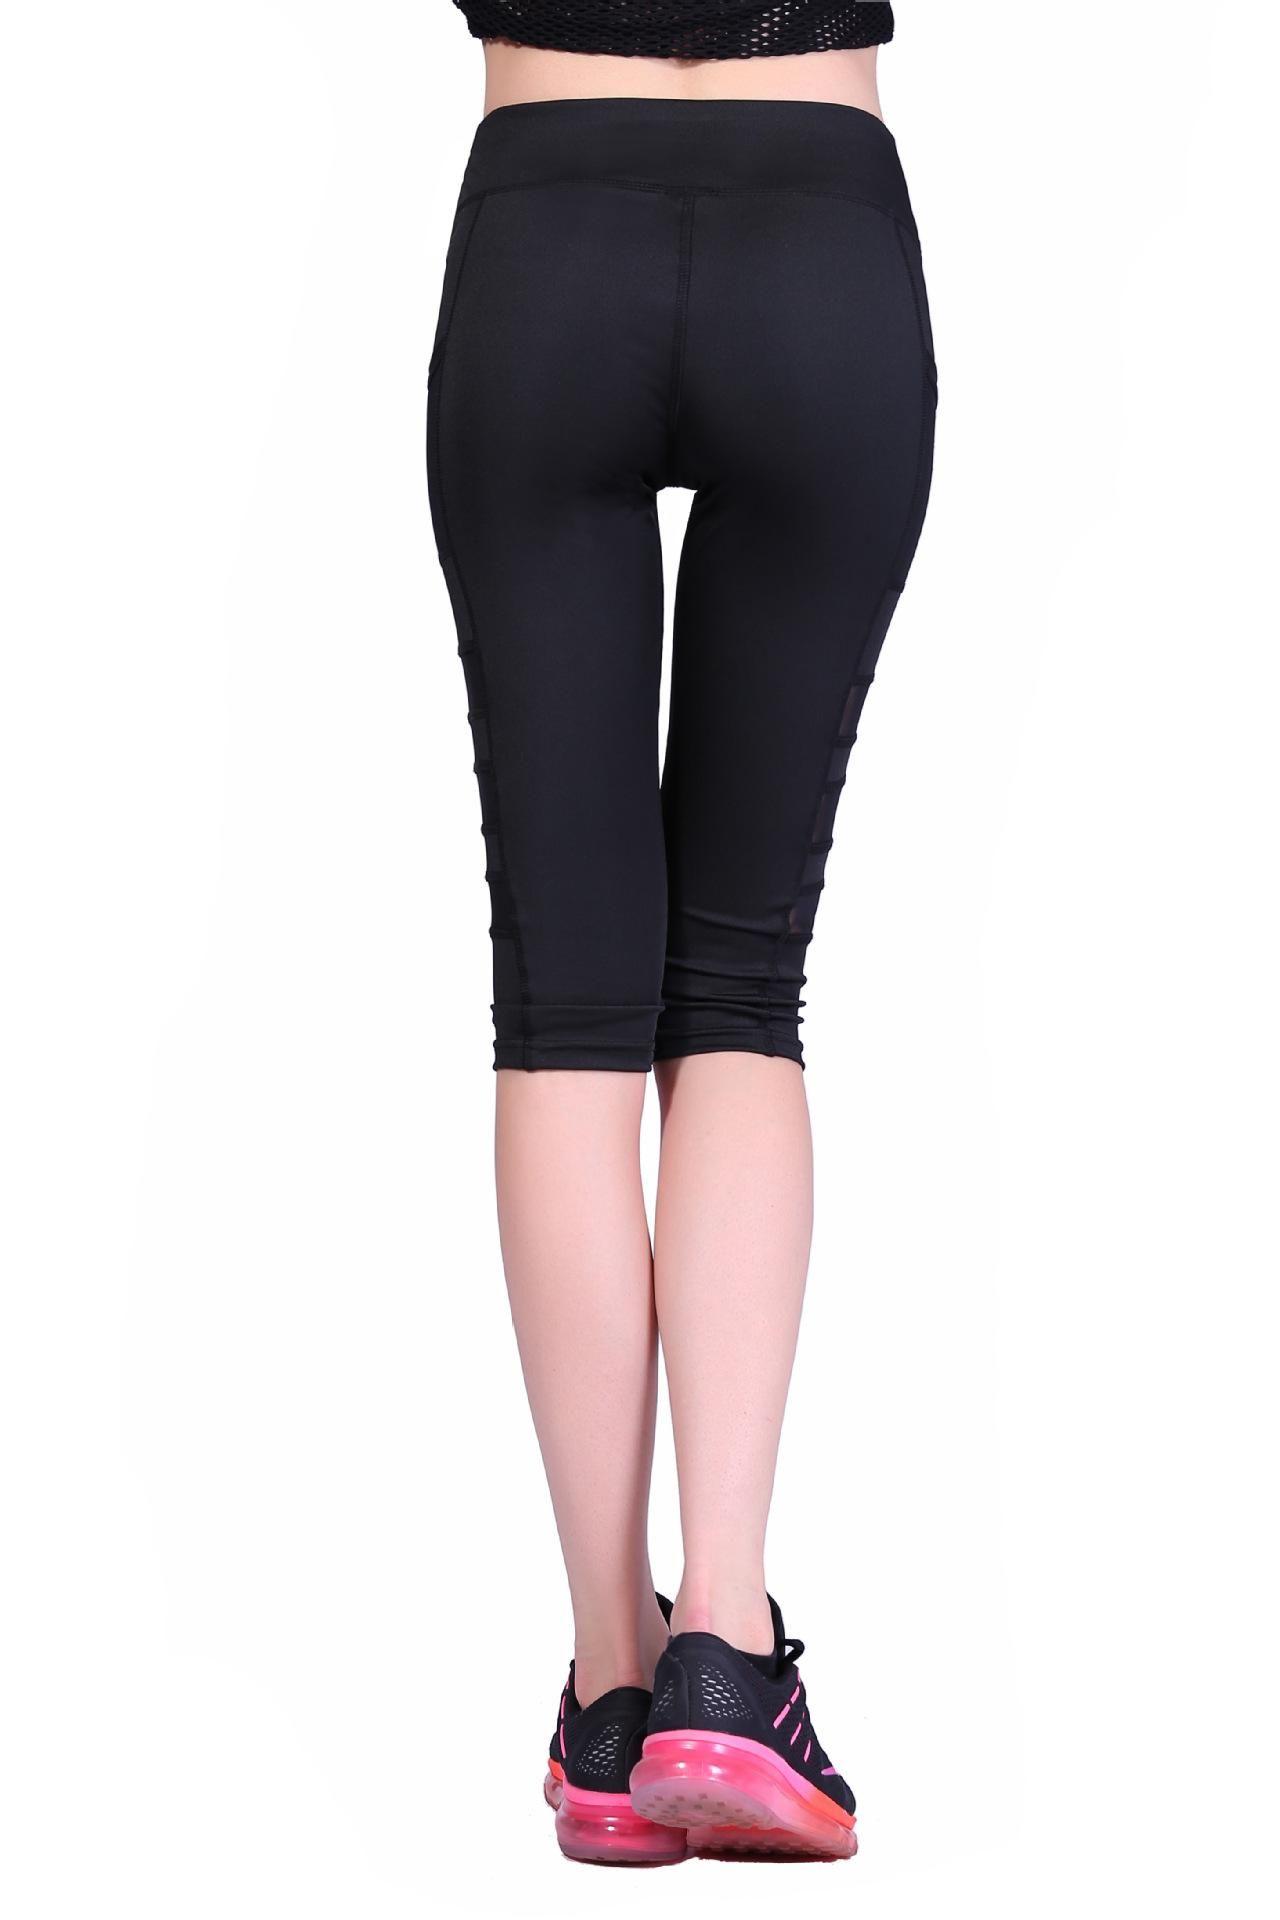 4a68845d73dc2 2019 2018 New Calf Length Pants Capri Pant Sport Leggings Women Fitness  Yoga Gym High Waist Legging Girl Black Mesh 3/4 Yoga Pants Women From  Newfstore, ...